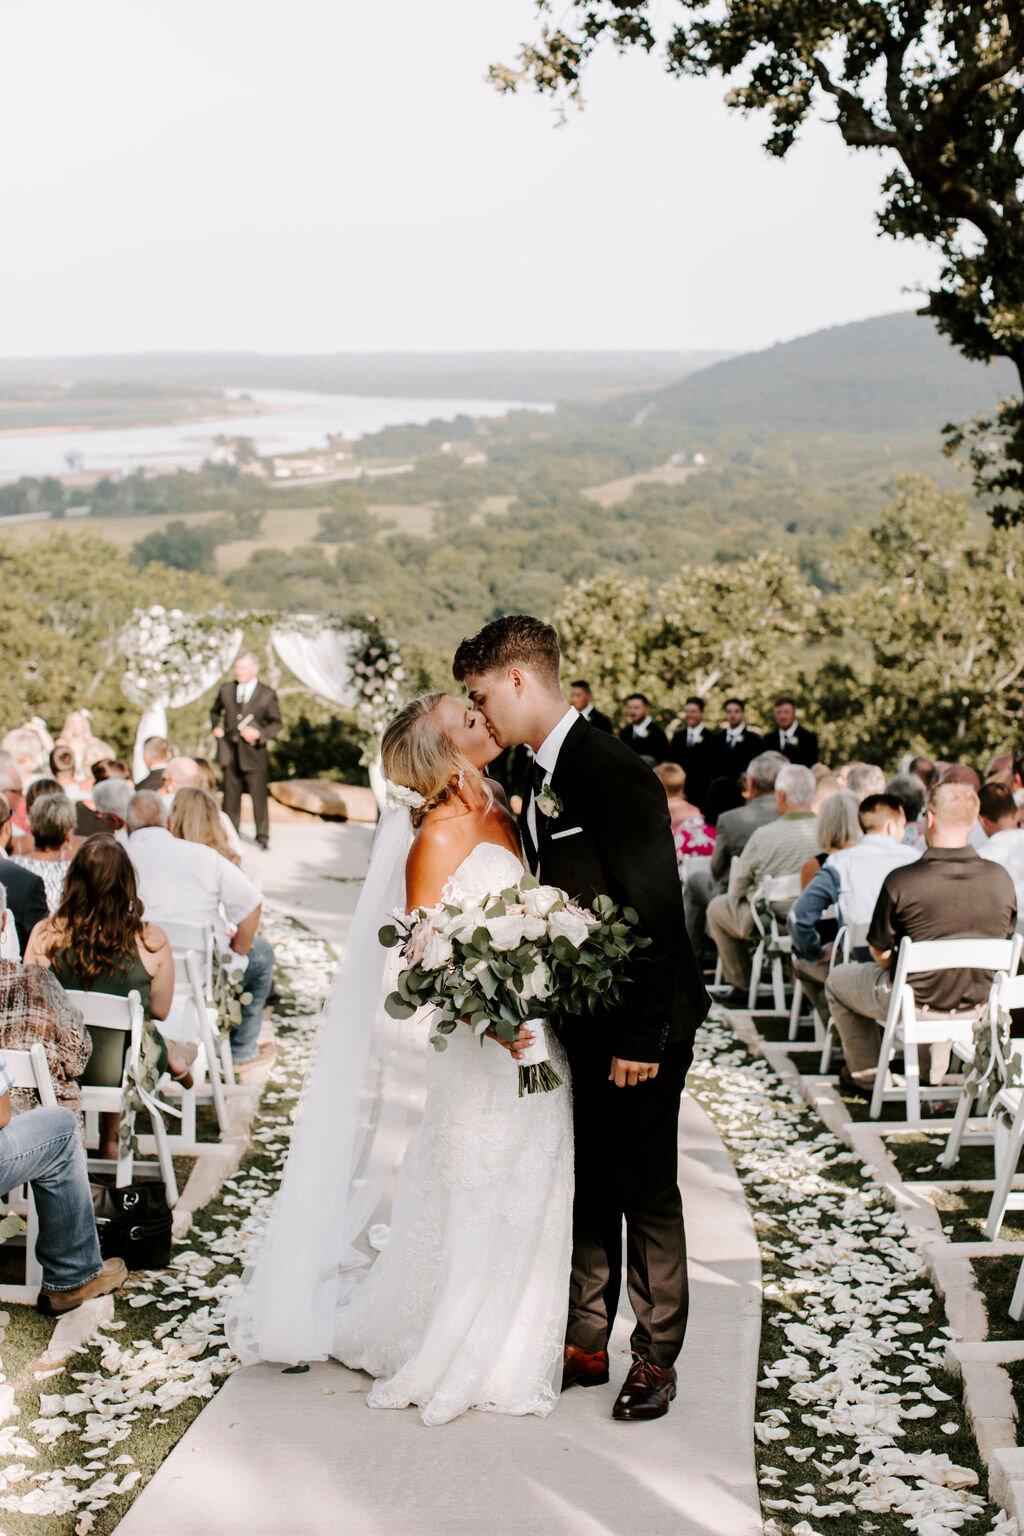 Tulsa White Barn Wedding Venue Outdoor Ceremony 96.jpg